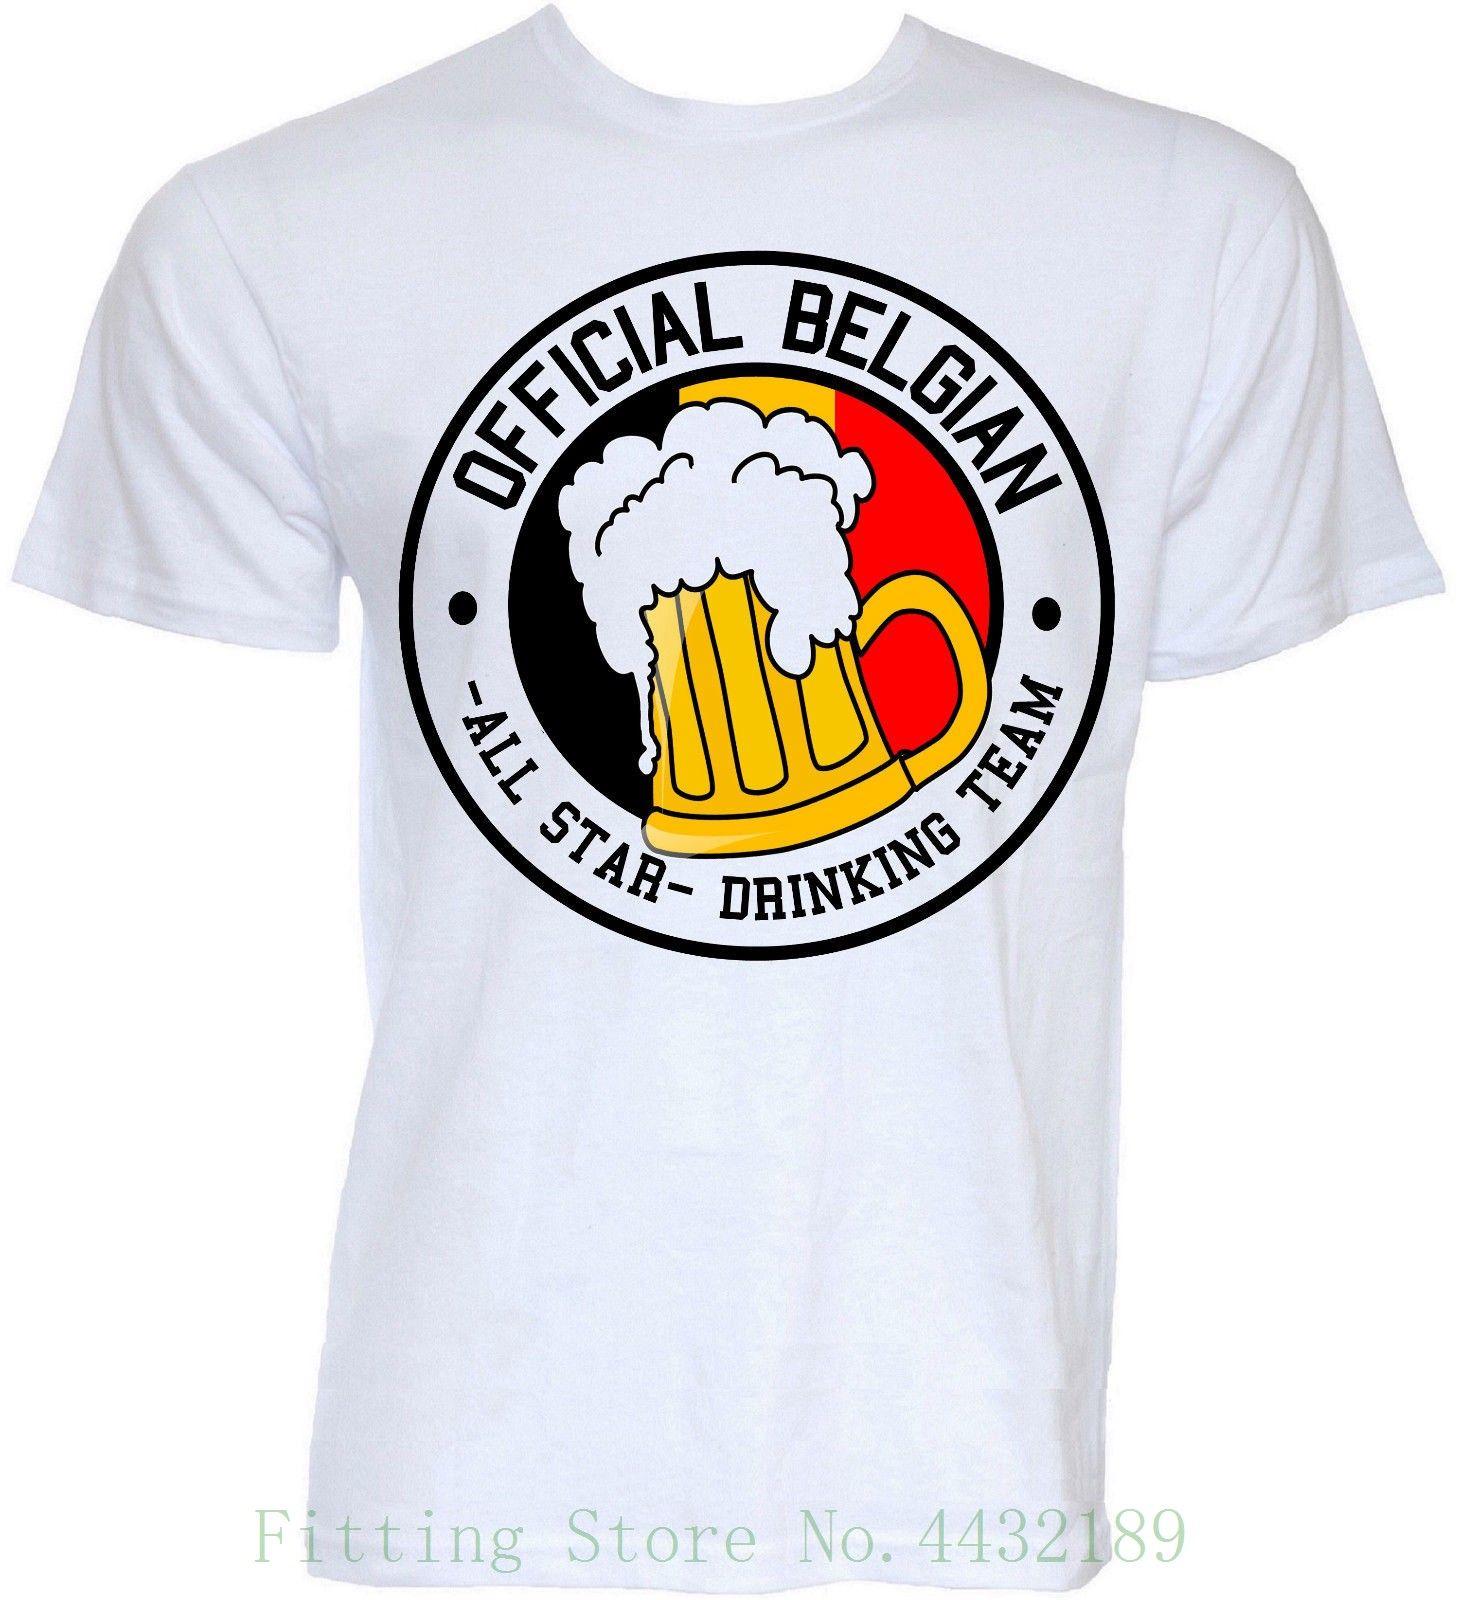 d0bcae858 Belgian Beer T Shirts - DREAMWORKS